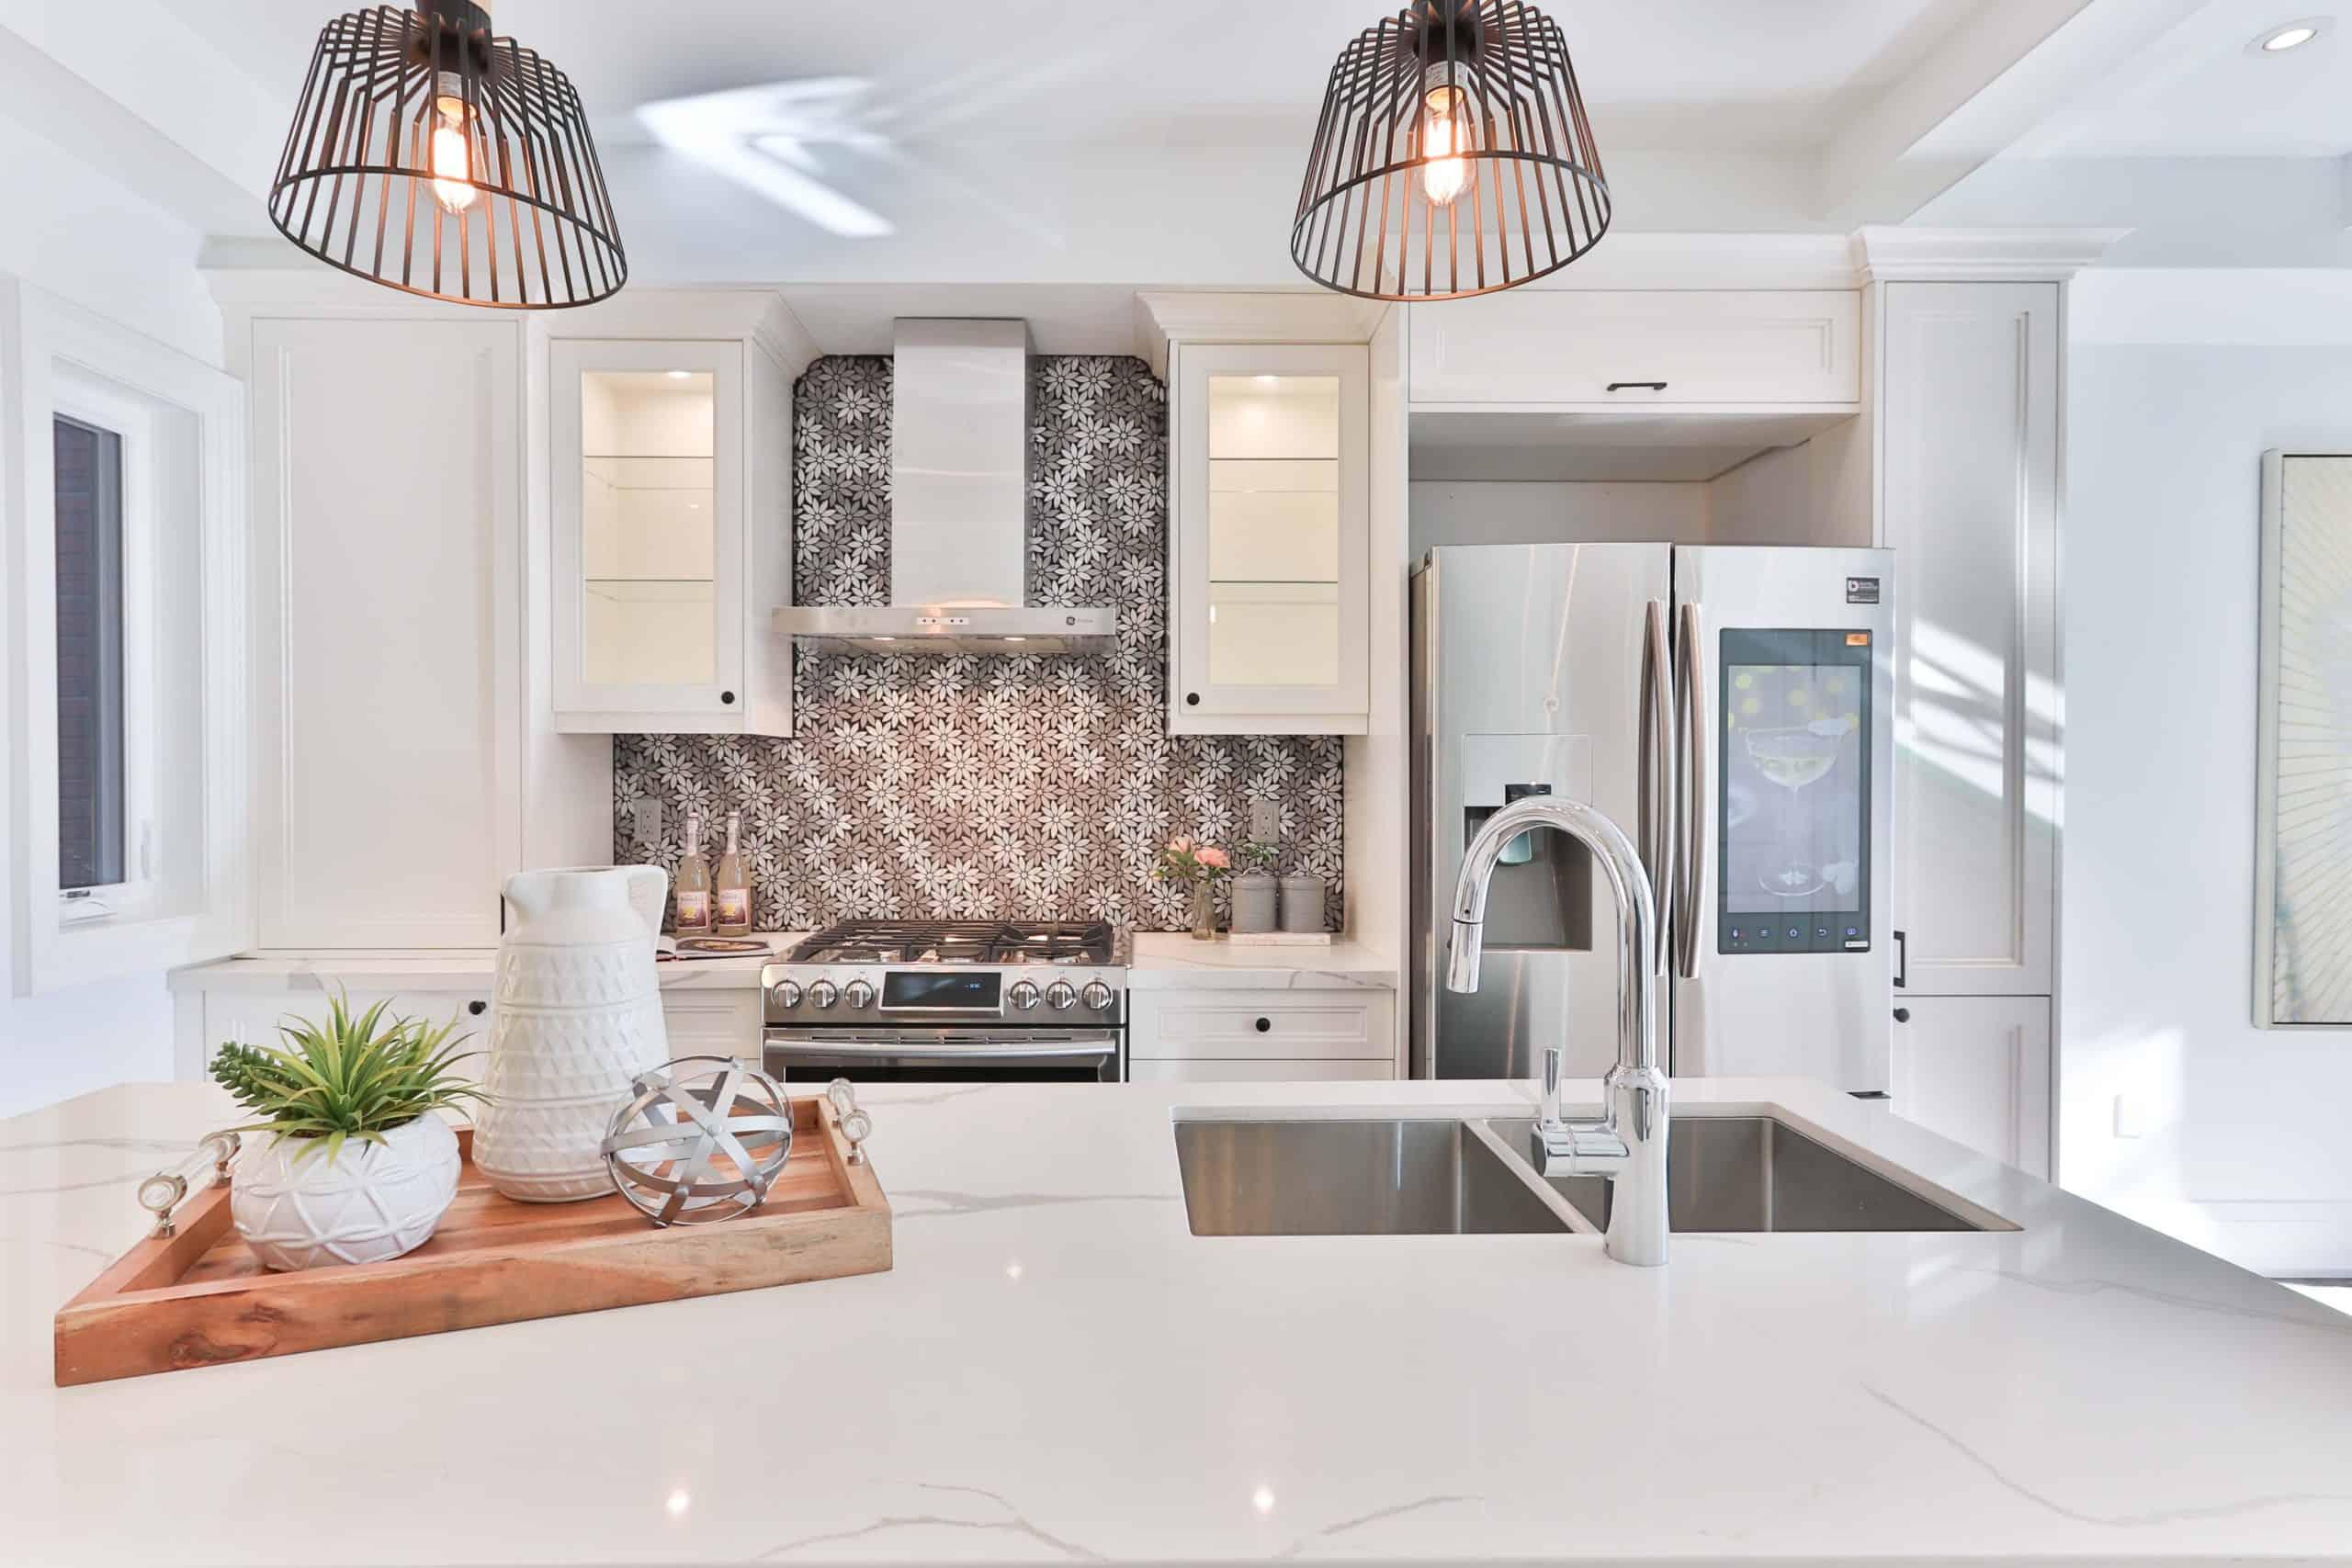 Kensington mortgage offer extension